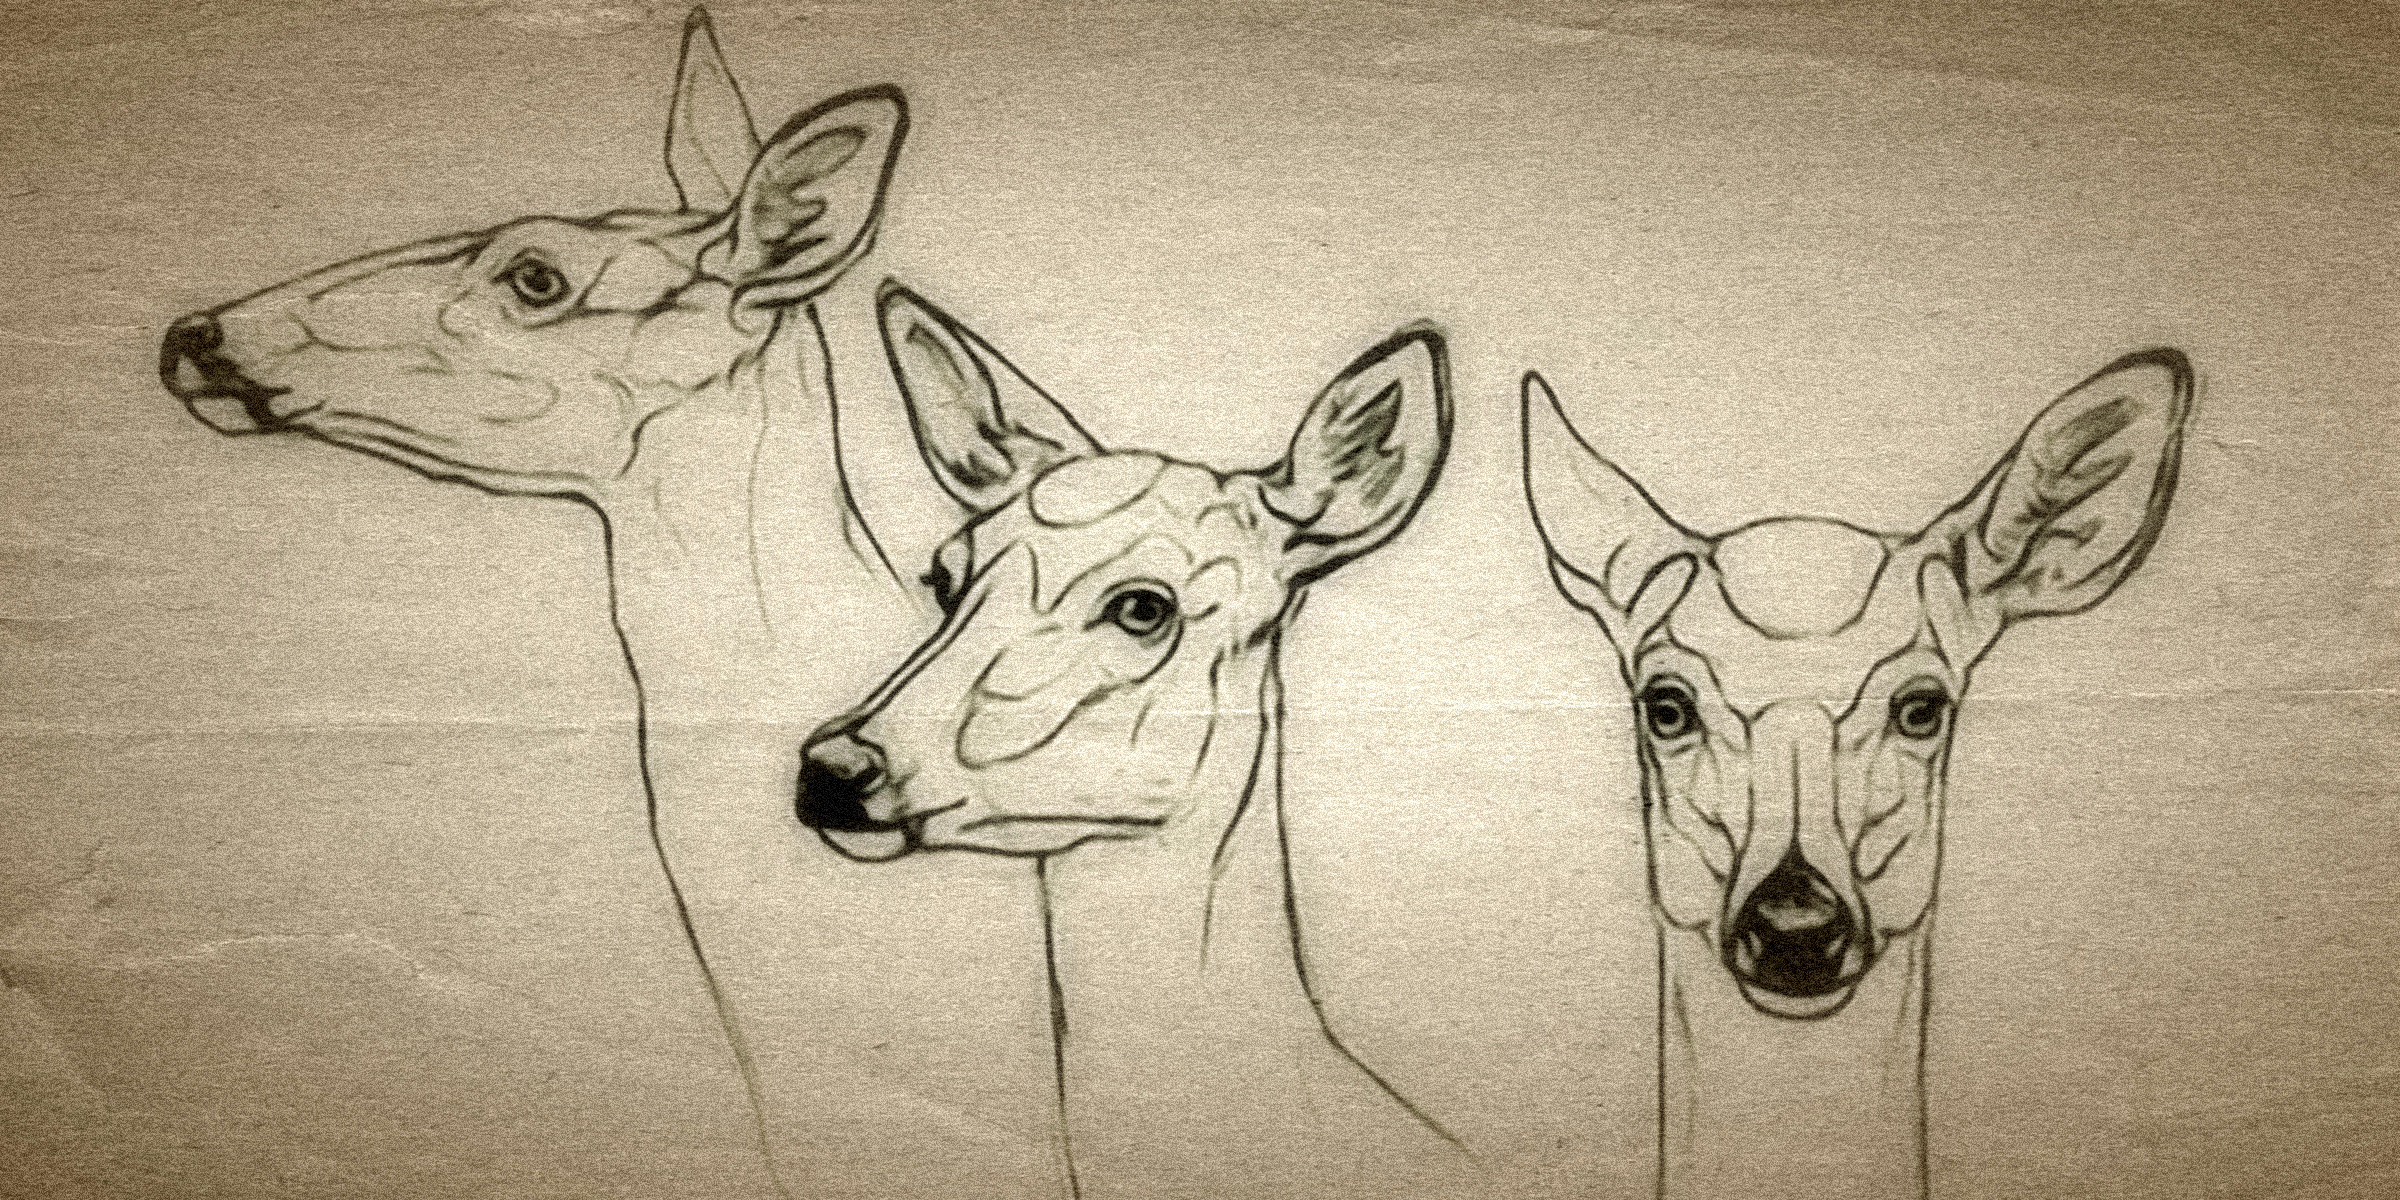 CLUTTERBUCK - Created by Jana Ross